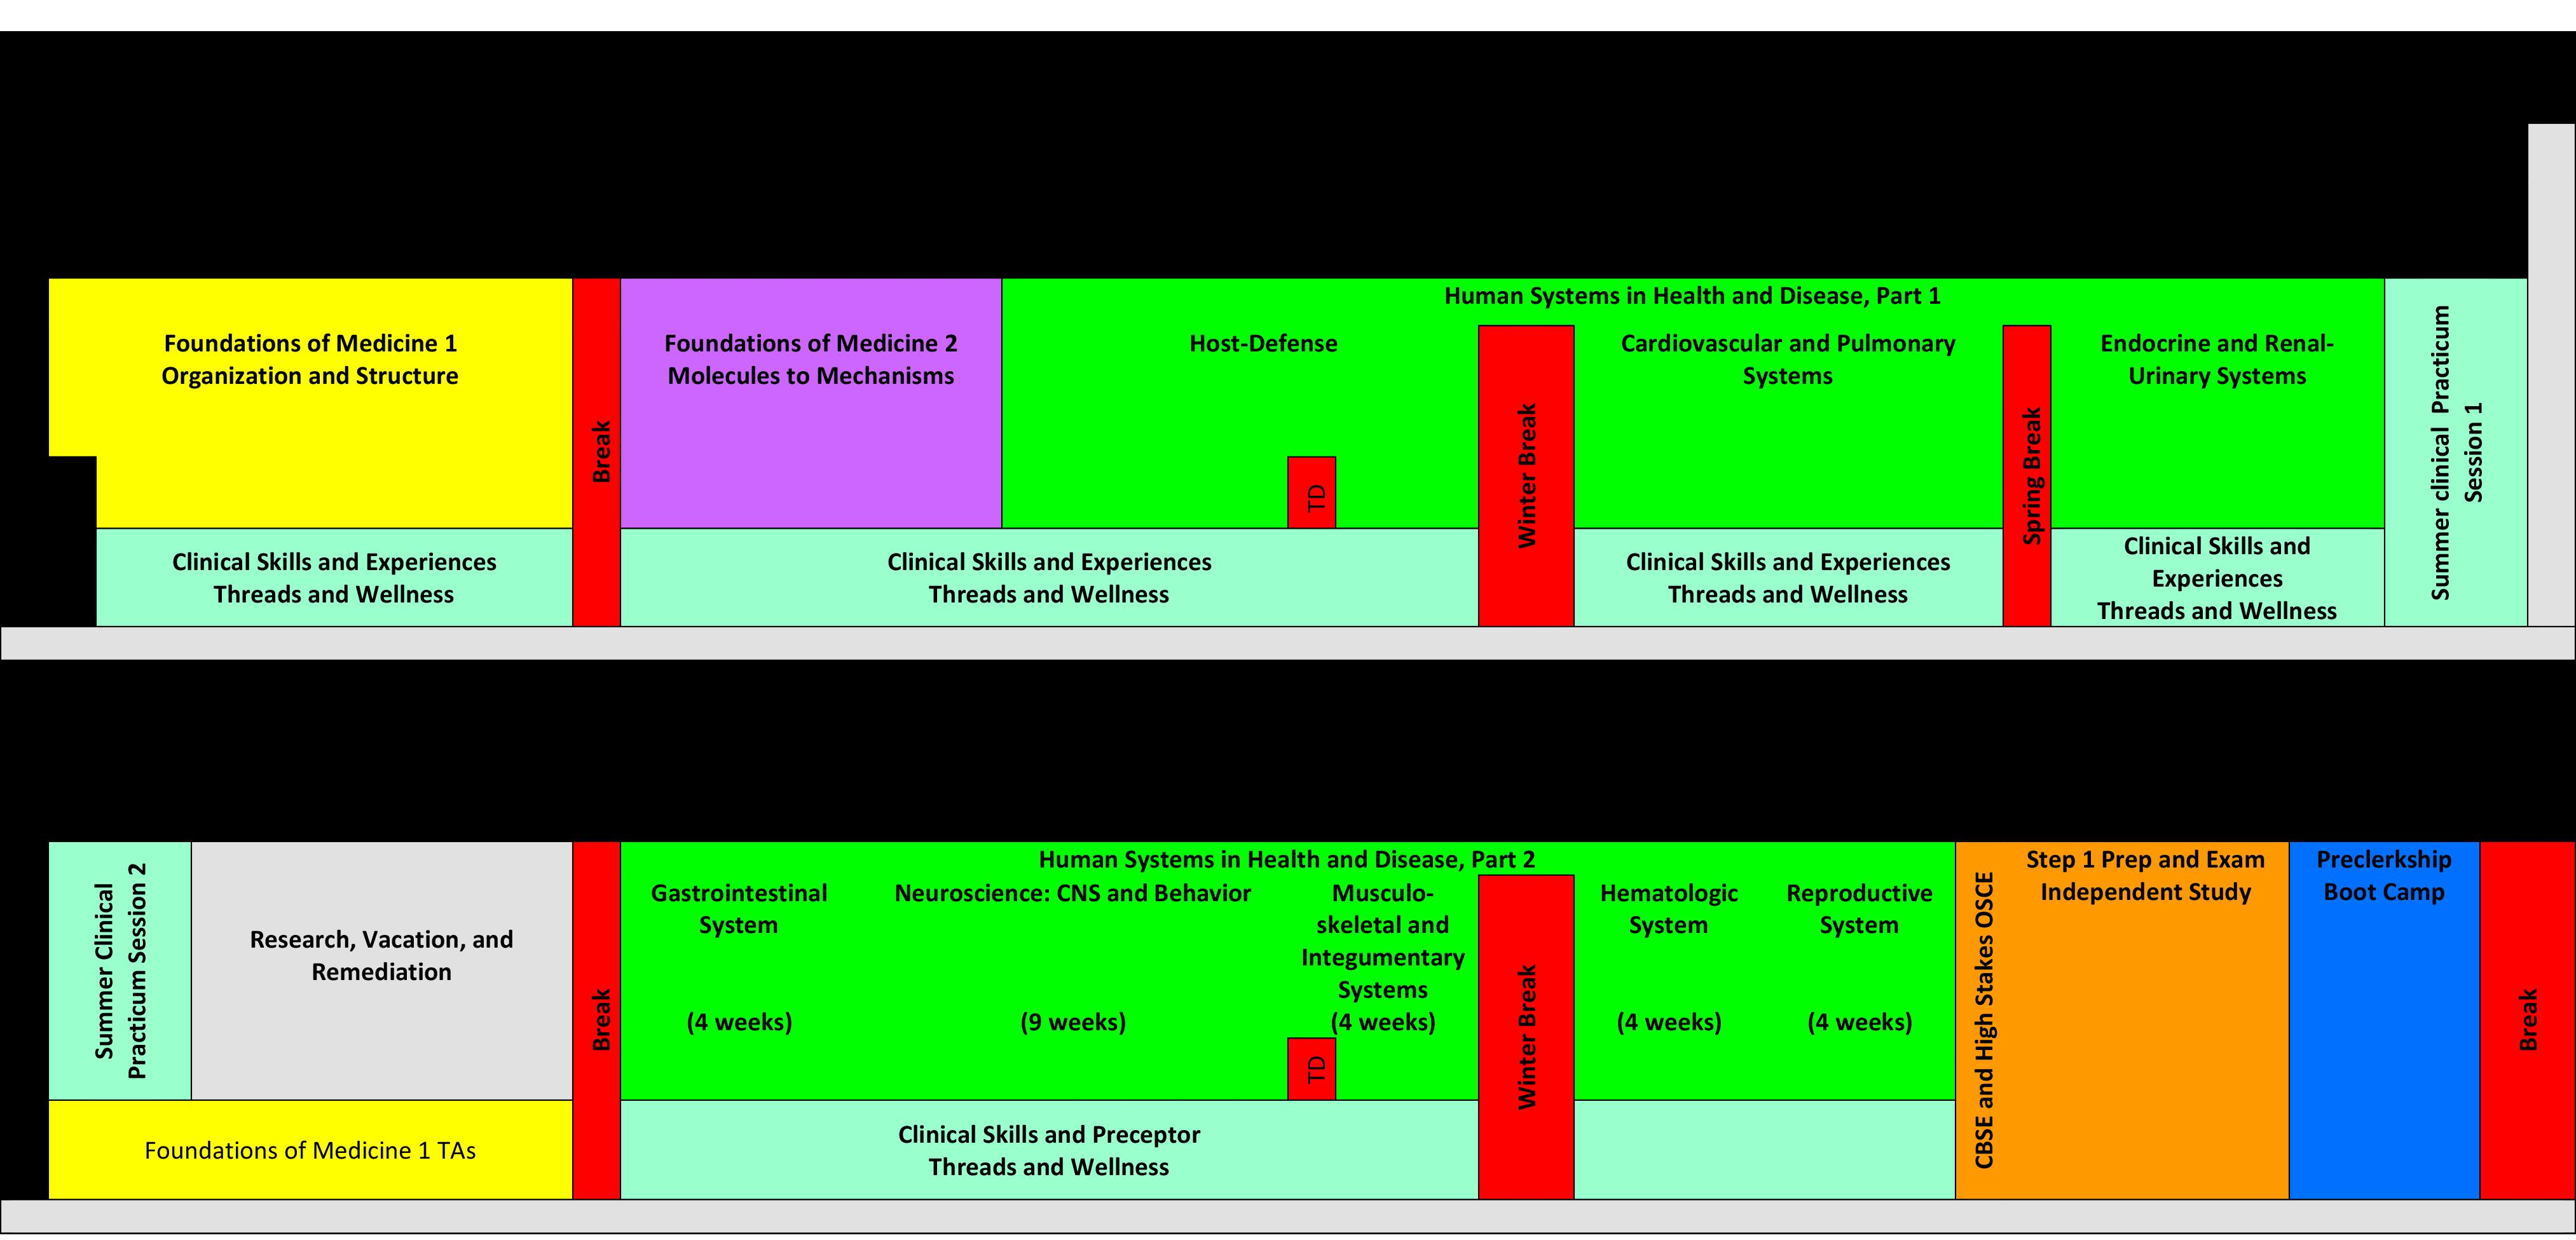 Fsu 2020 Calendar Current Year Academic Calendar | College of Medicine